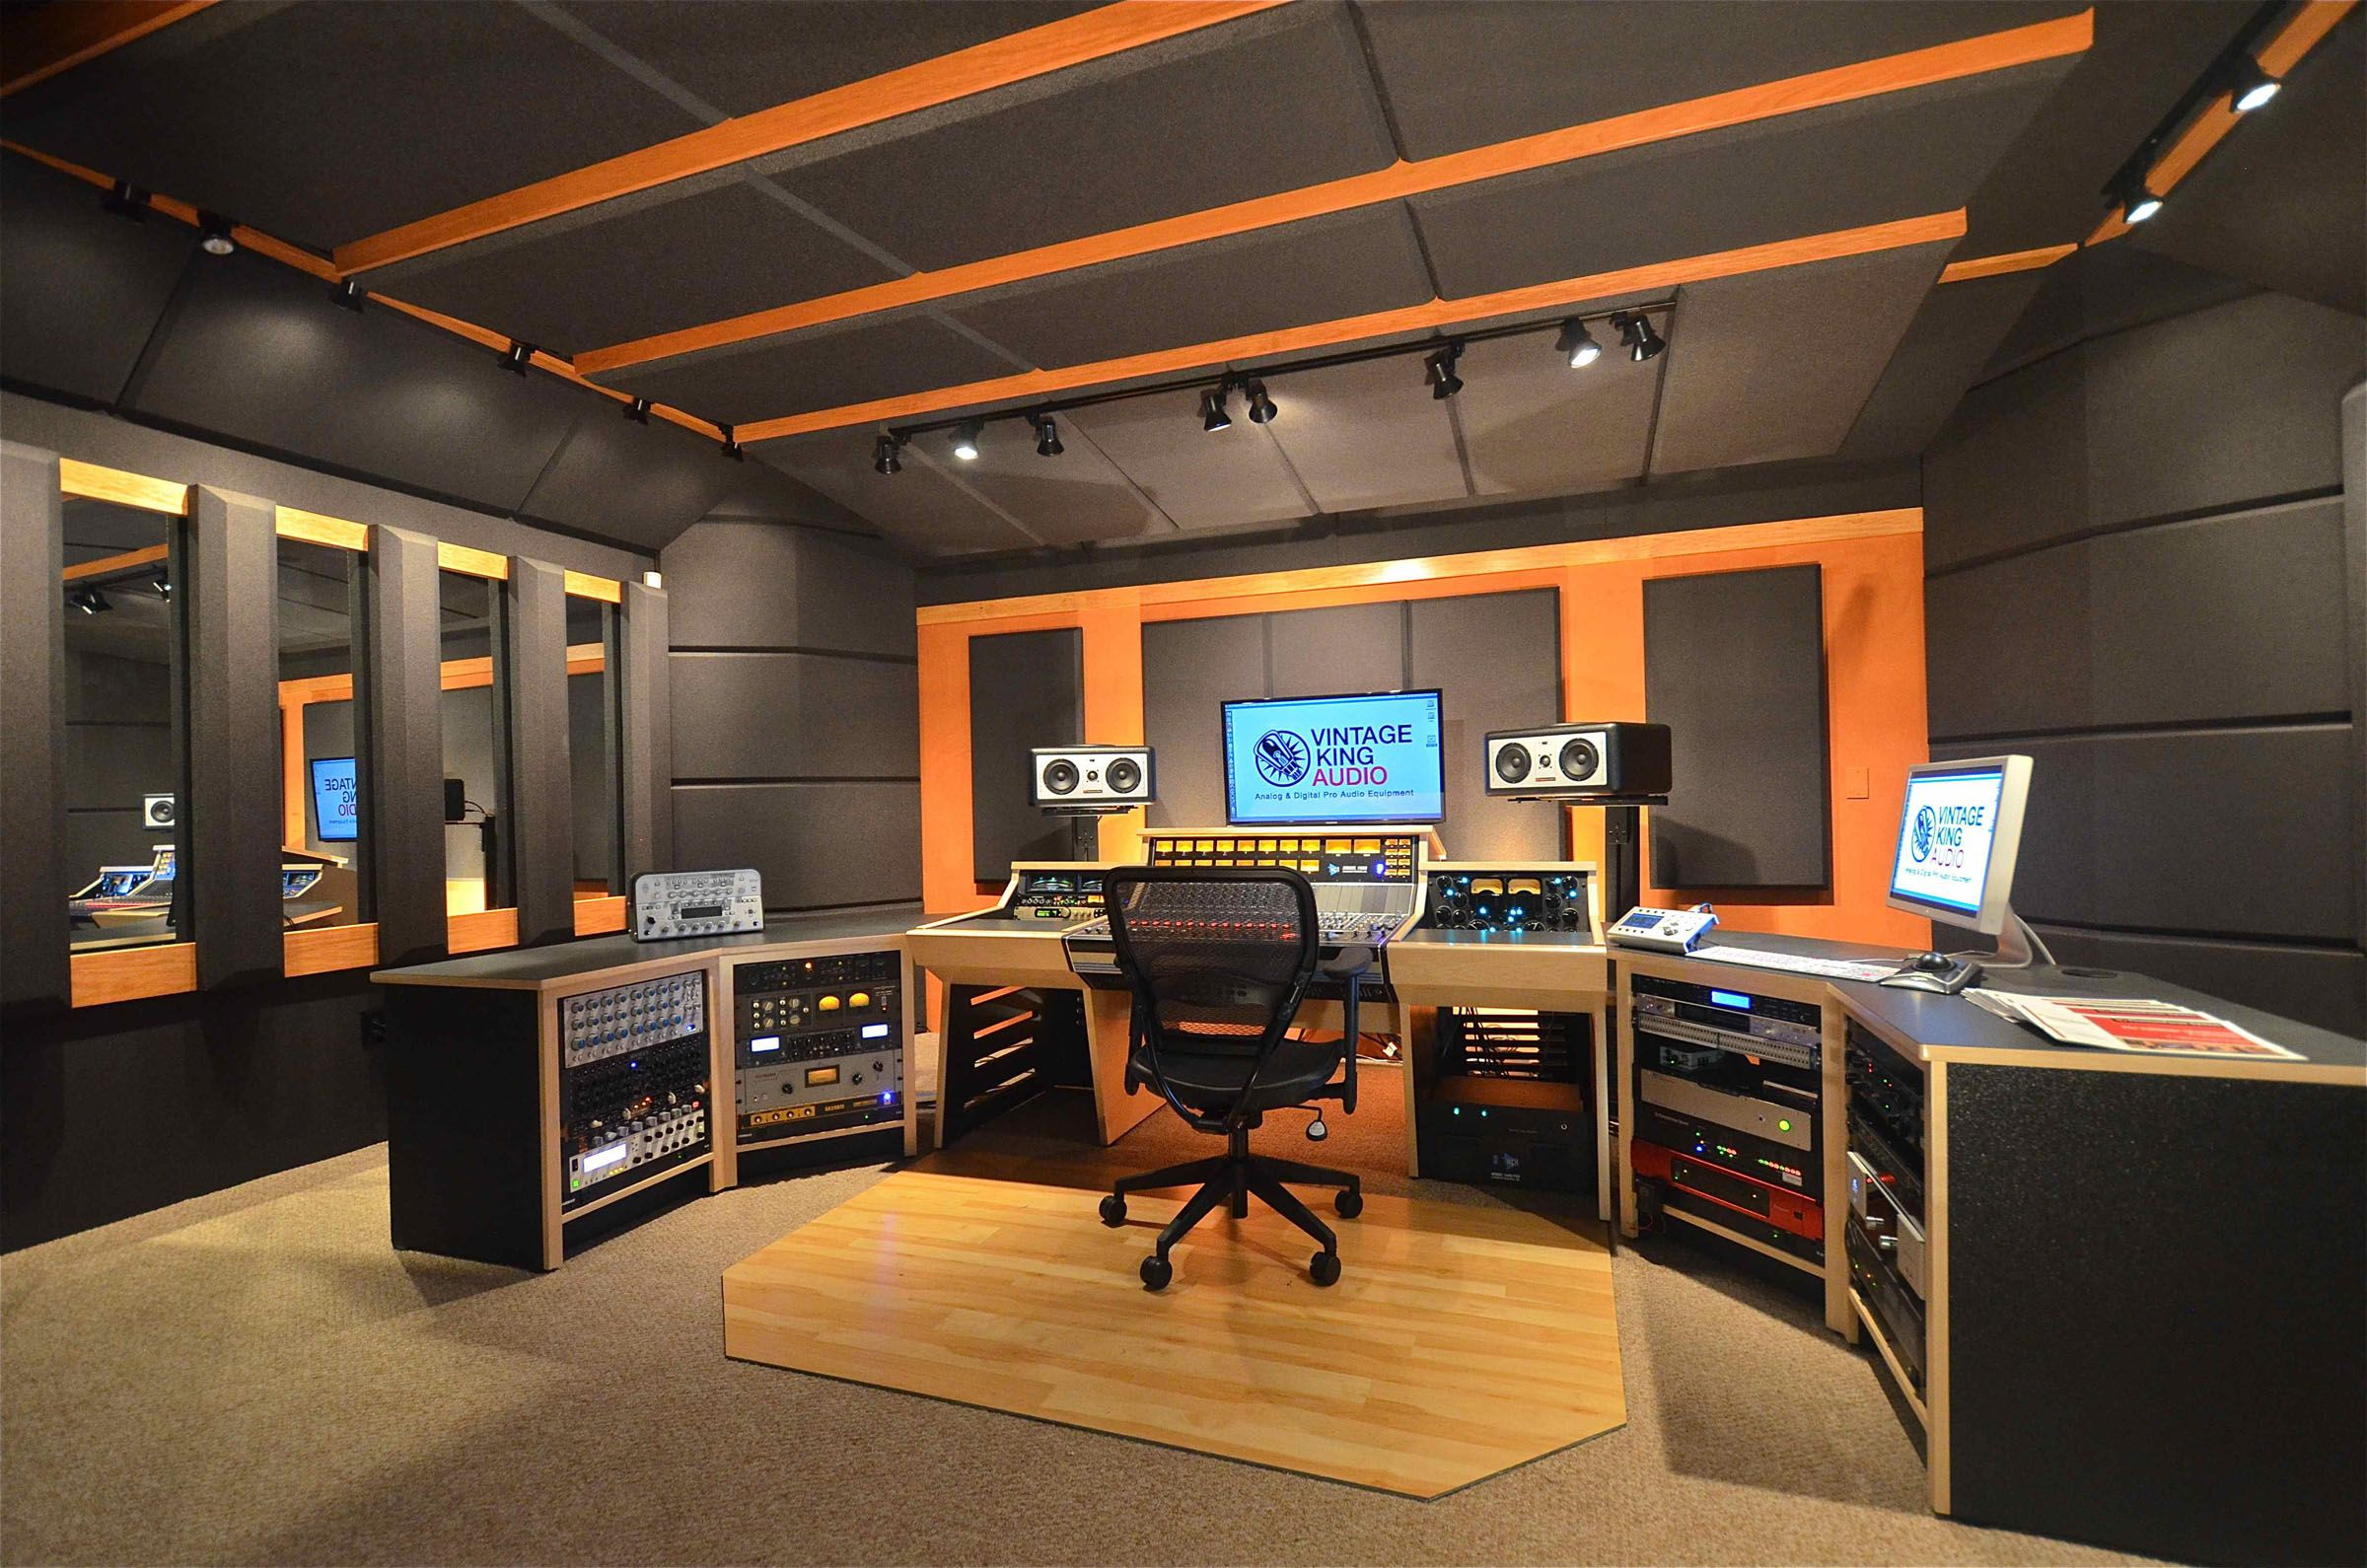 designing a sound recording studio - Google Search ...